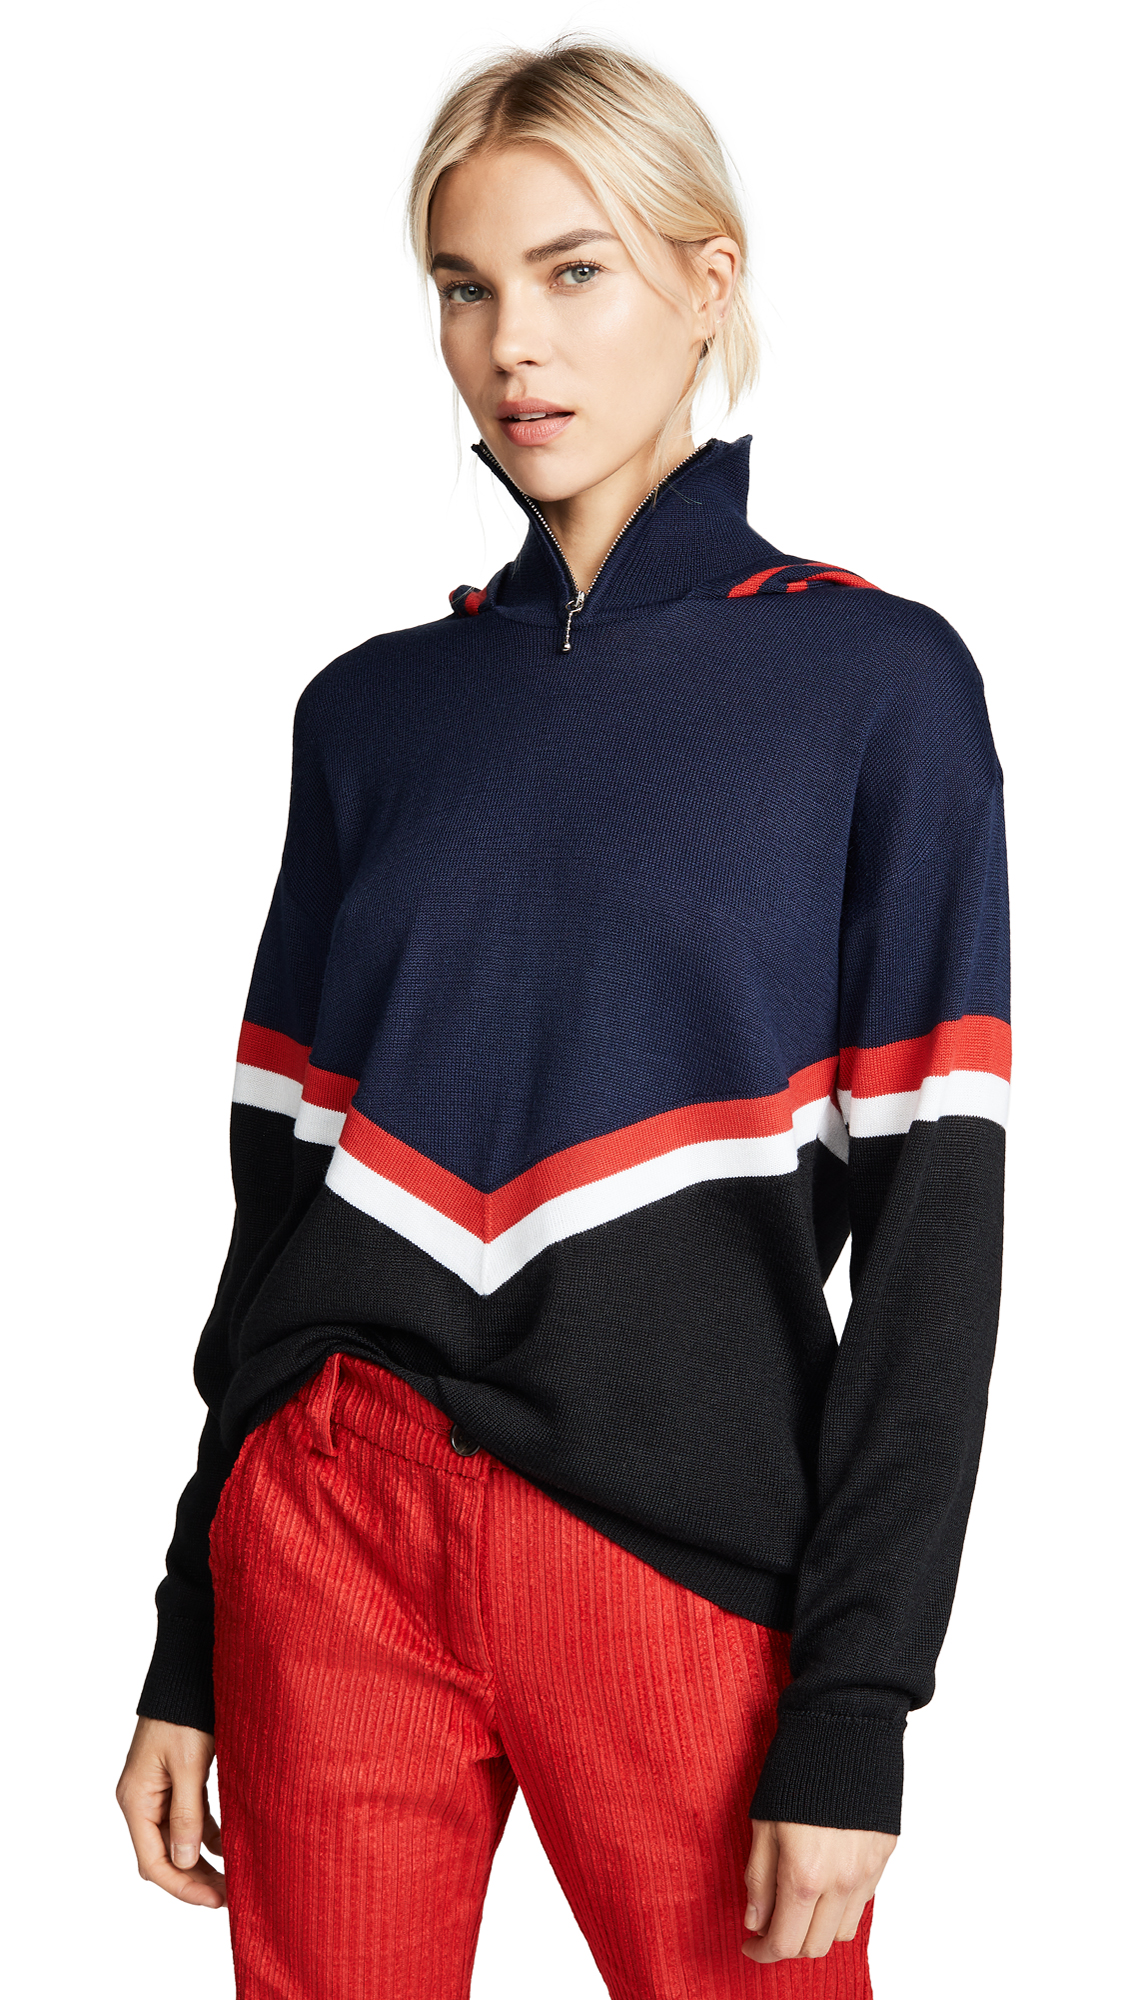 MARIANNA SENCHINA Turtleneck Sweater in Dark Blue